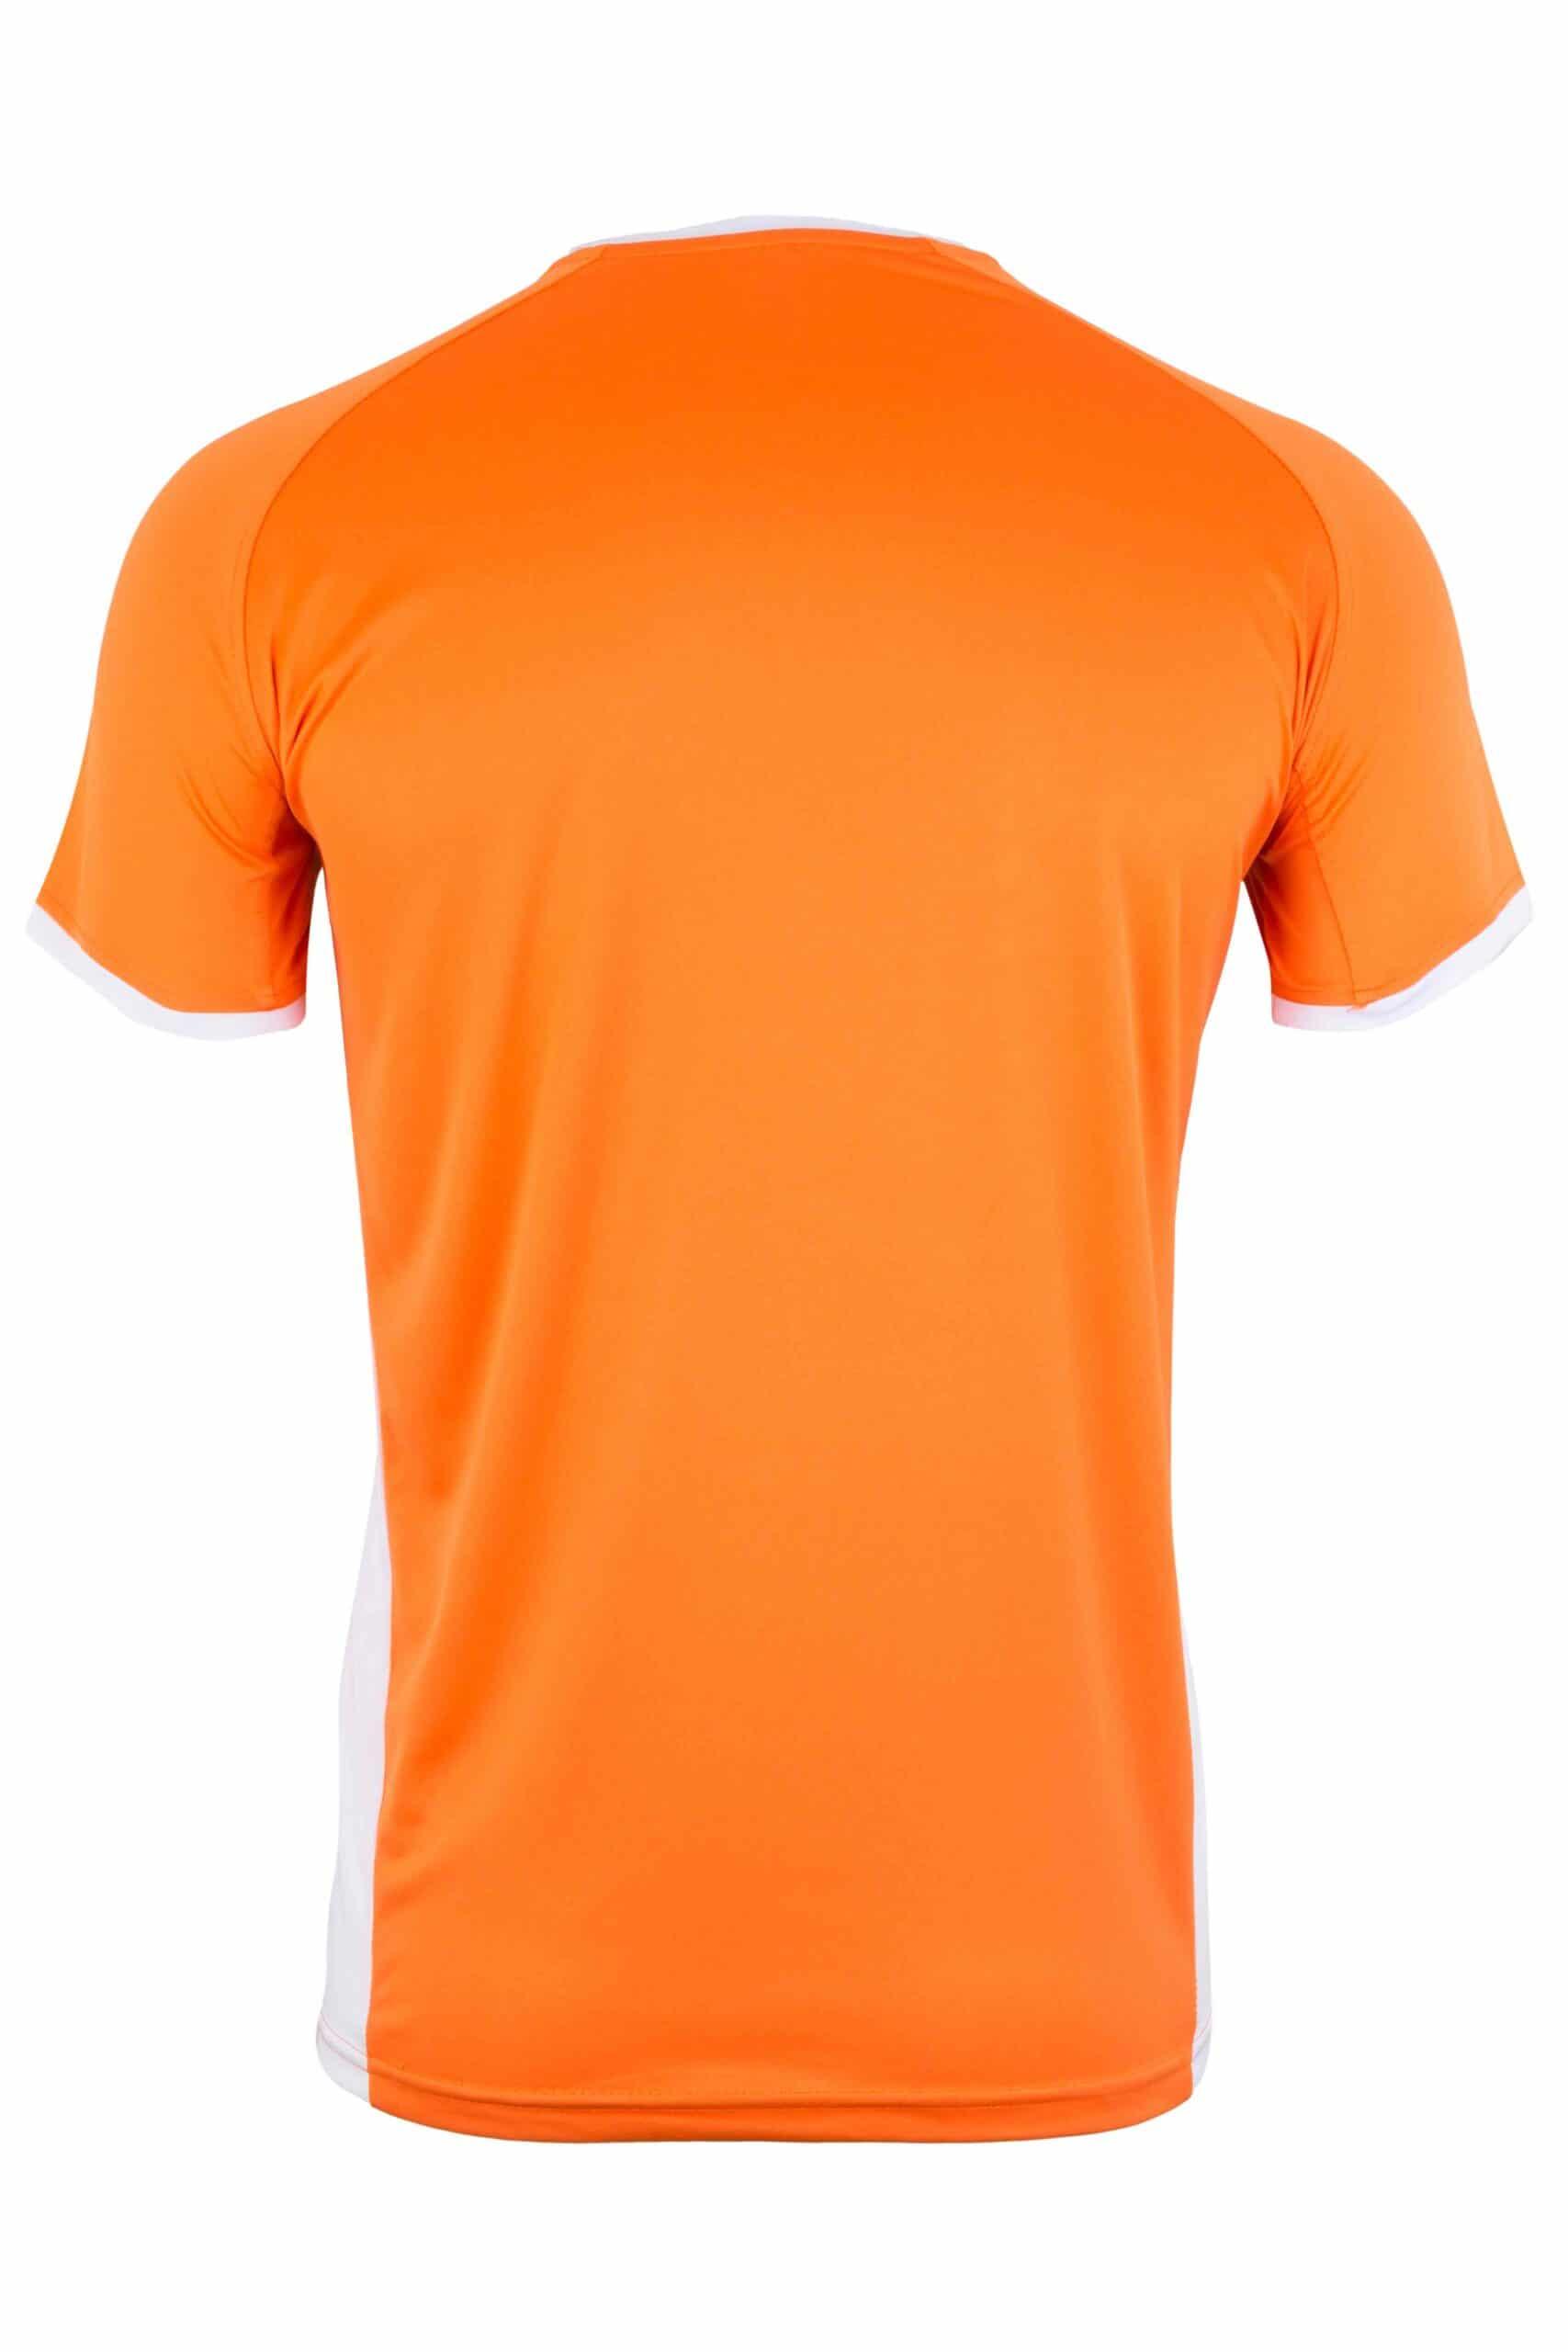 Mukua Mk530v Mukua Camiseta TÉcnica Manga Corta Bicolor Orange White 2